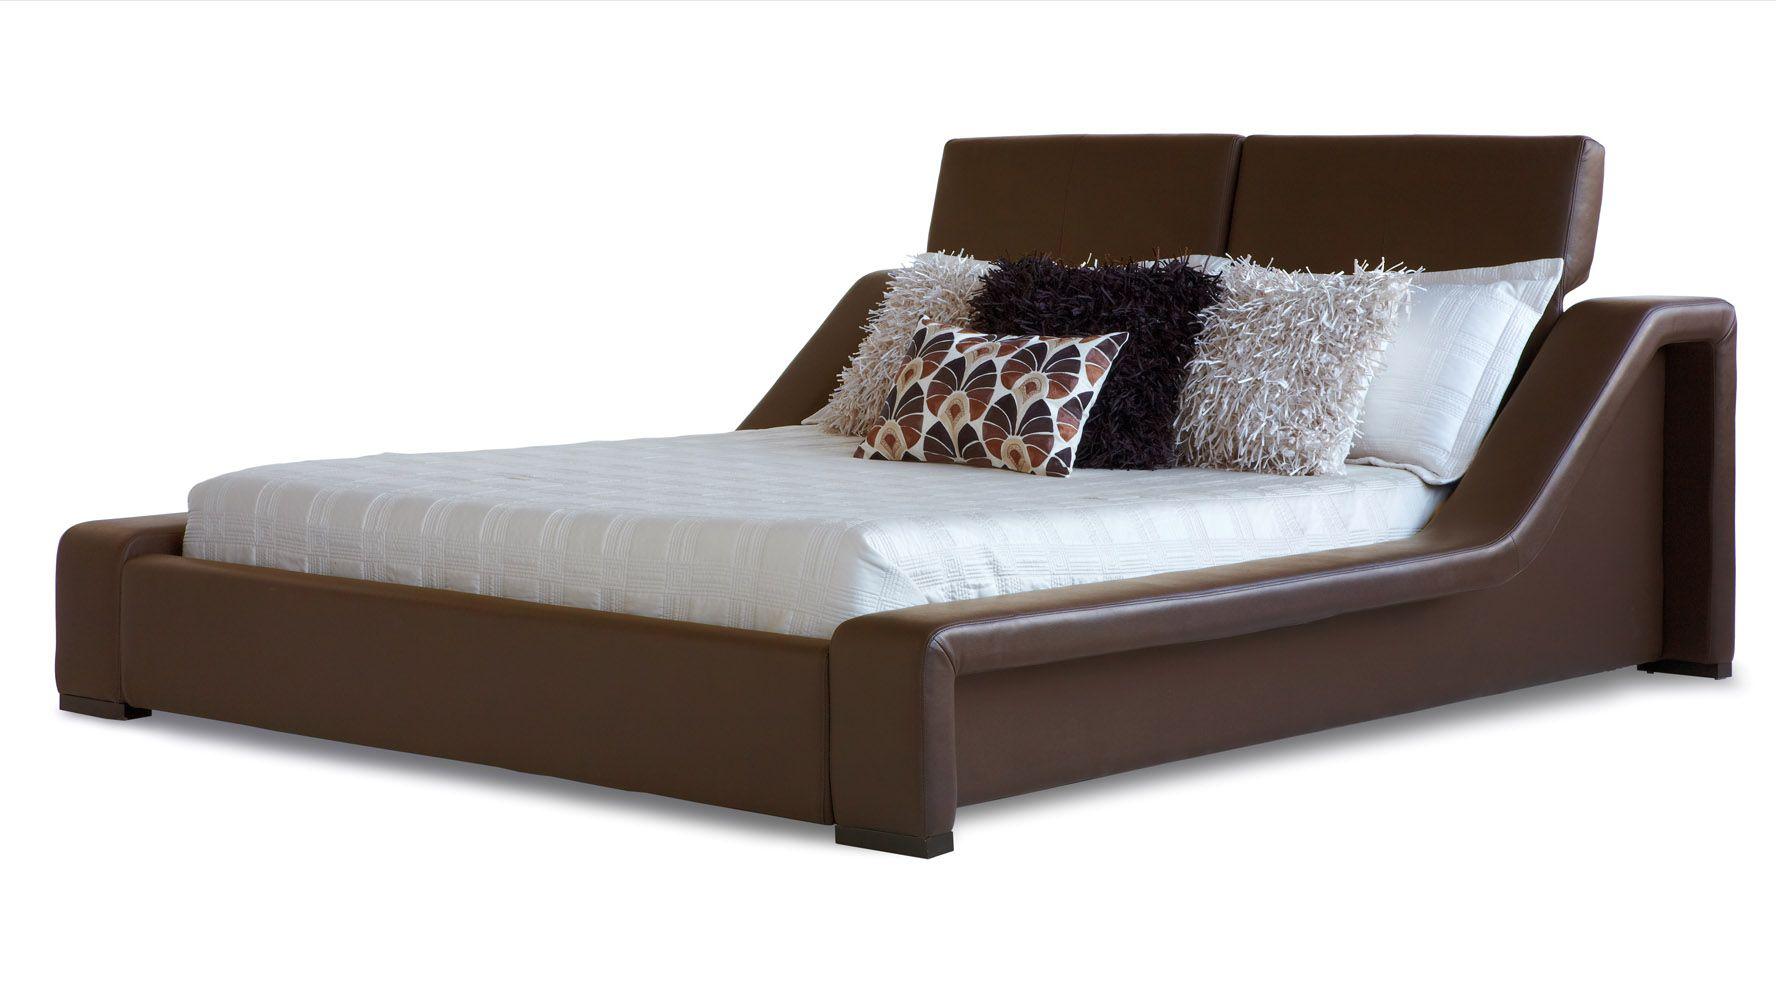 London leather contemporary platform bed brown zuri furniture